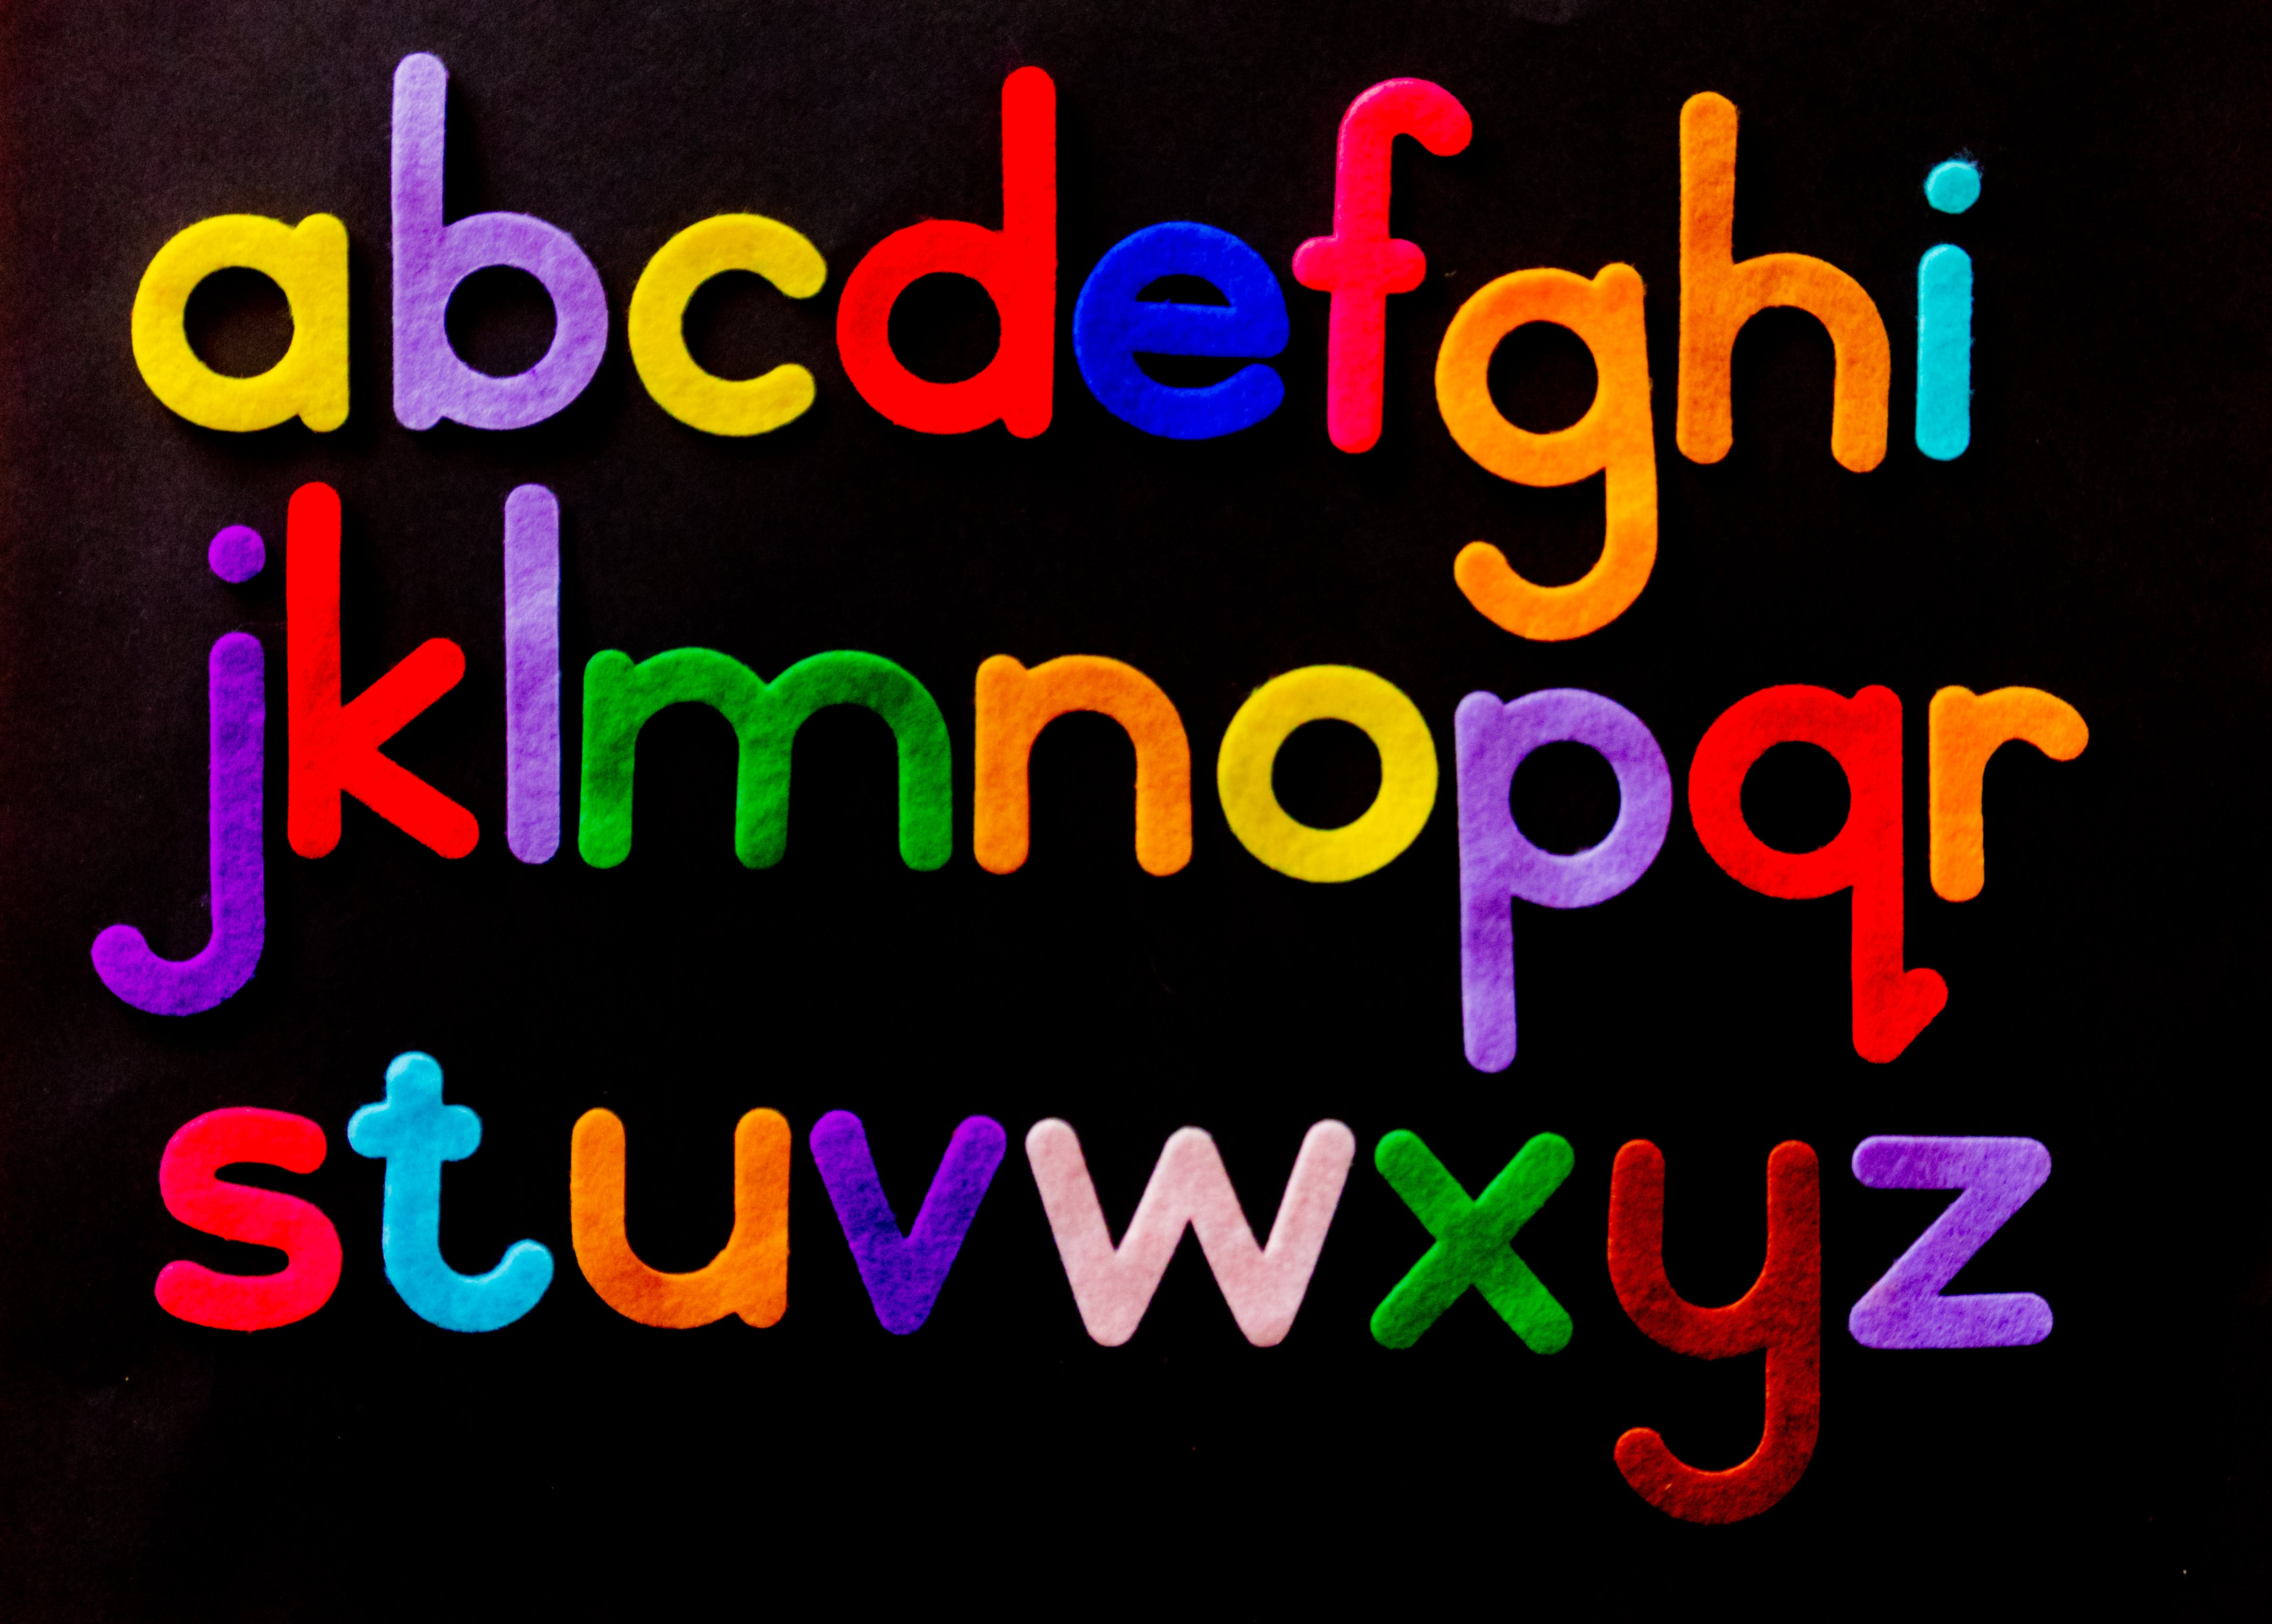 Alphabet letters on black background